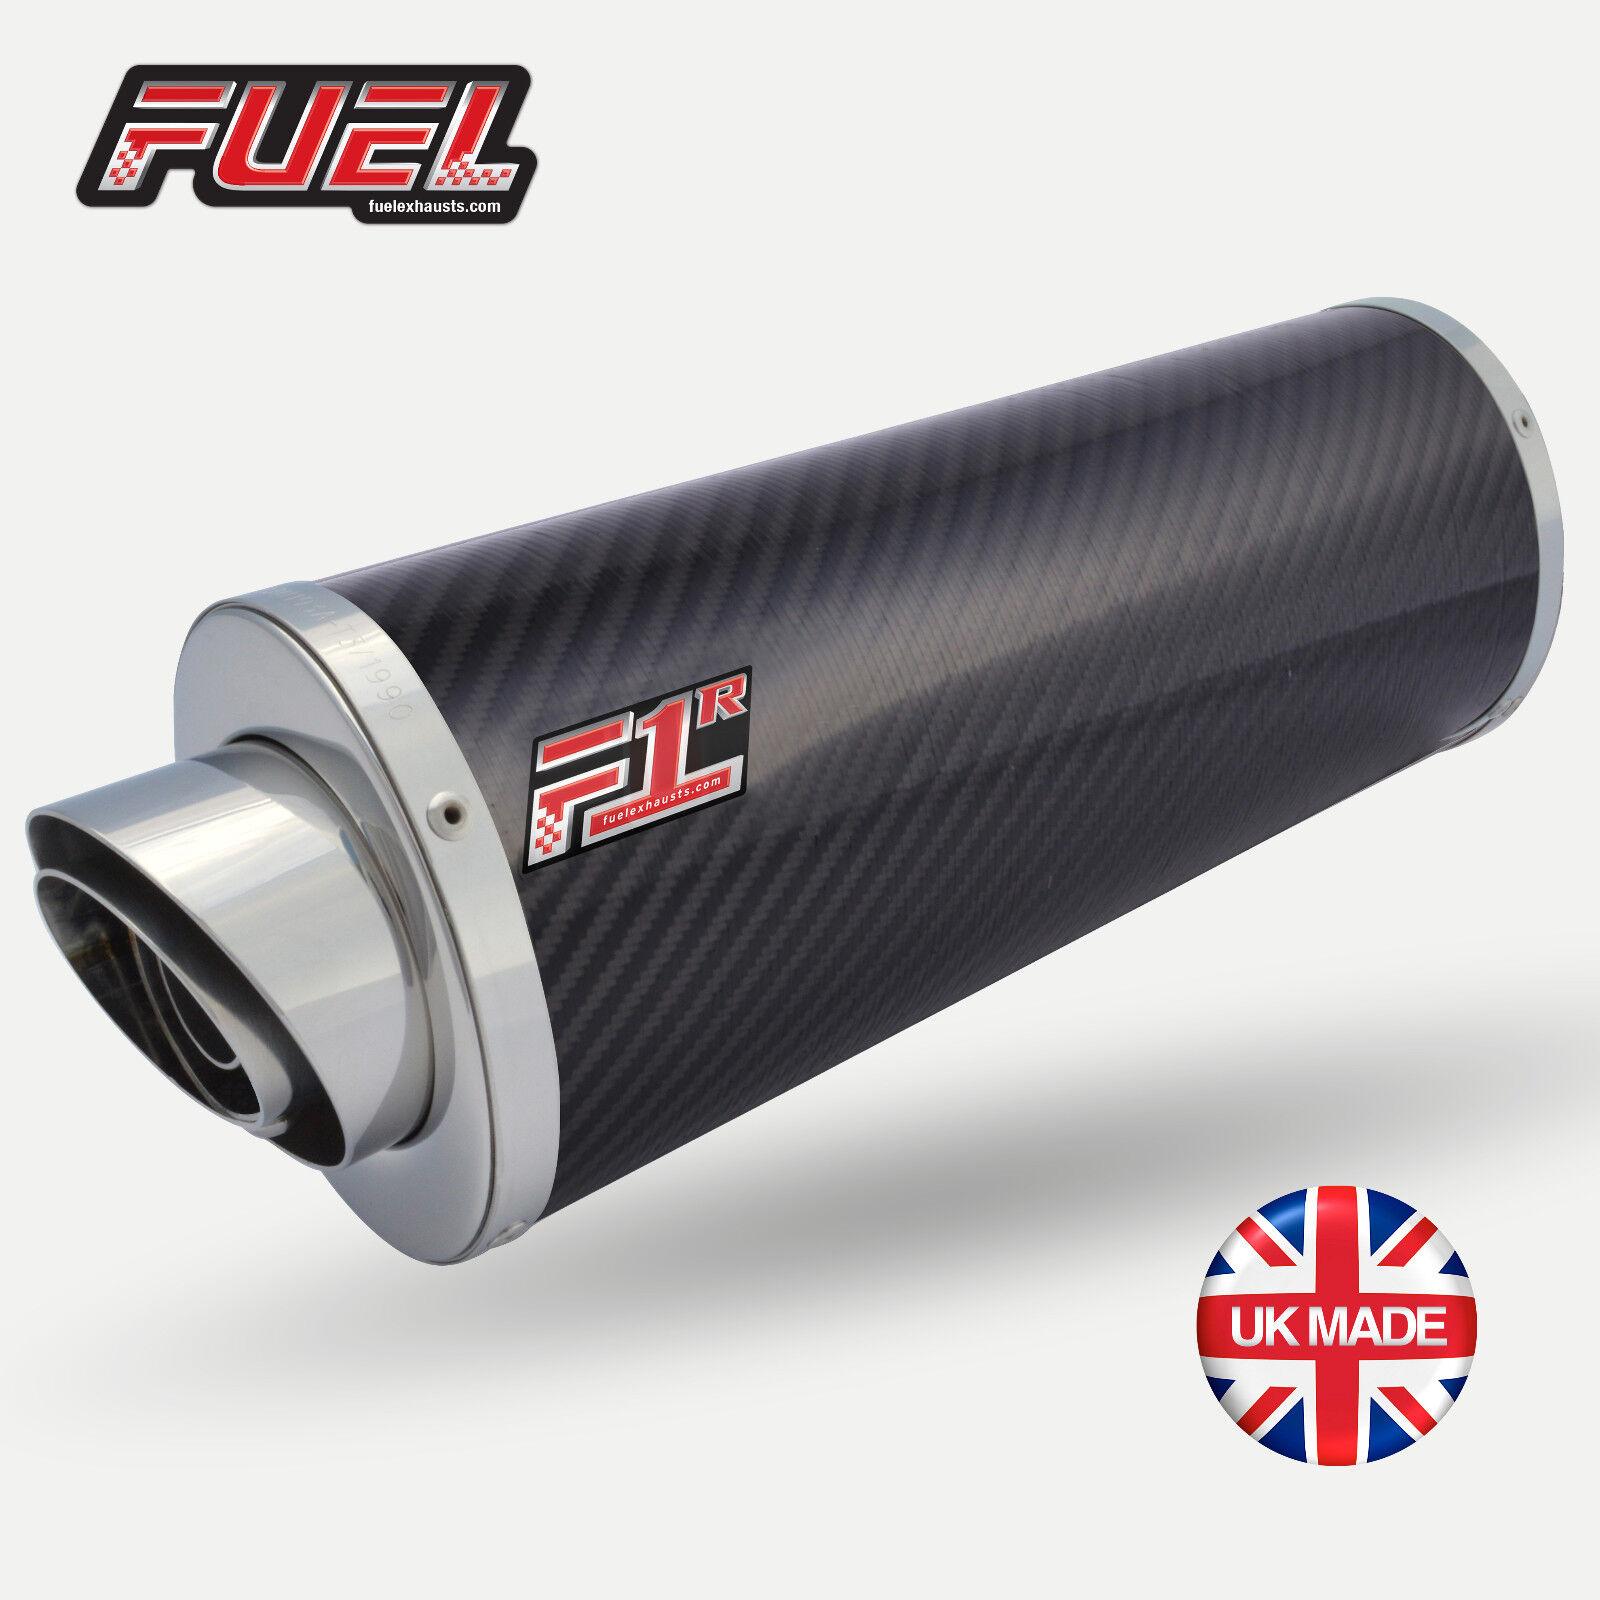 NC750 S X 14-15 F1R Road Karbon Oval Mikromini UK UK UK Legaler Straßenauspuff + 8ee3e8